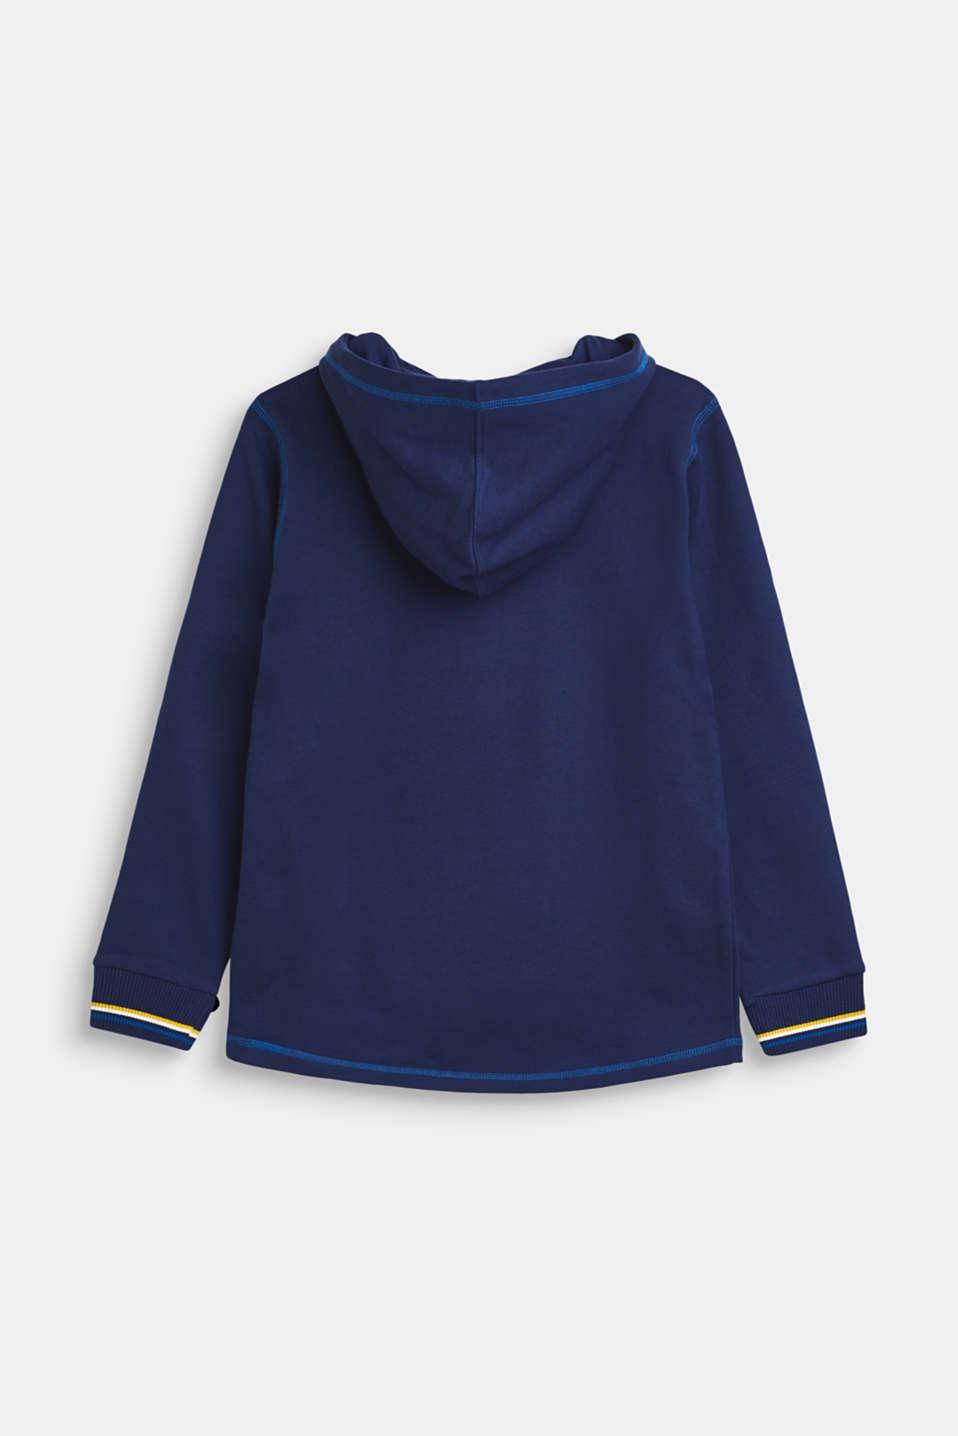 Sweatshirt hoodie with fleece lining, 100% cotton, LCMARINE BLUE, detail image number 1